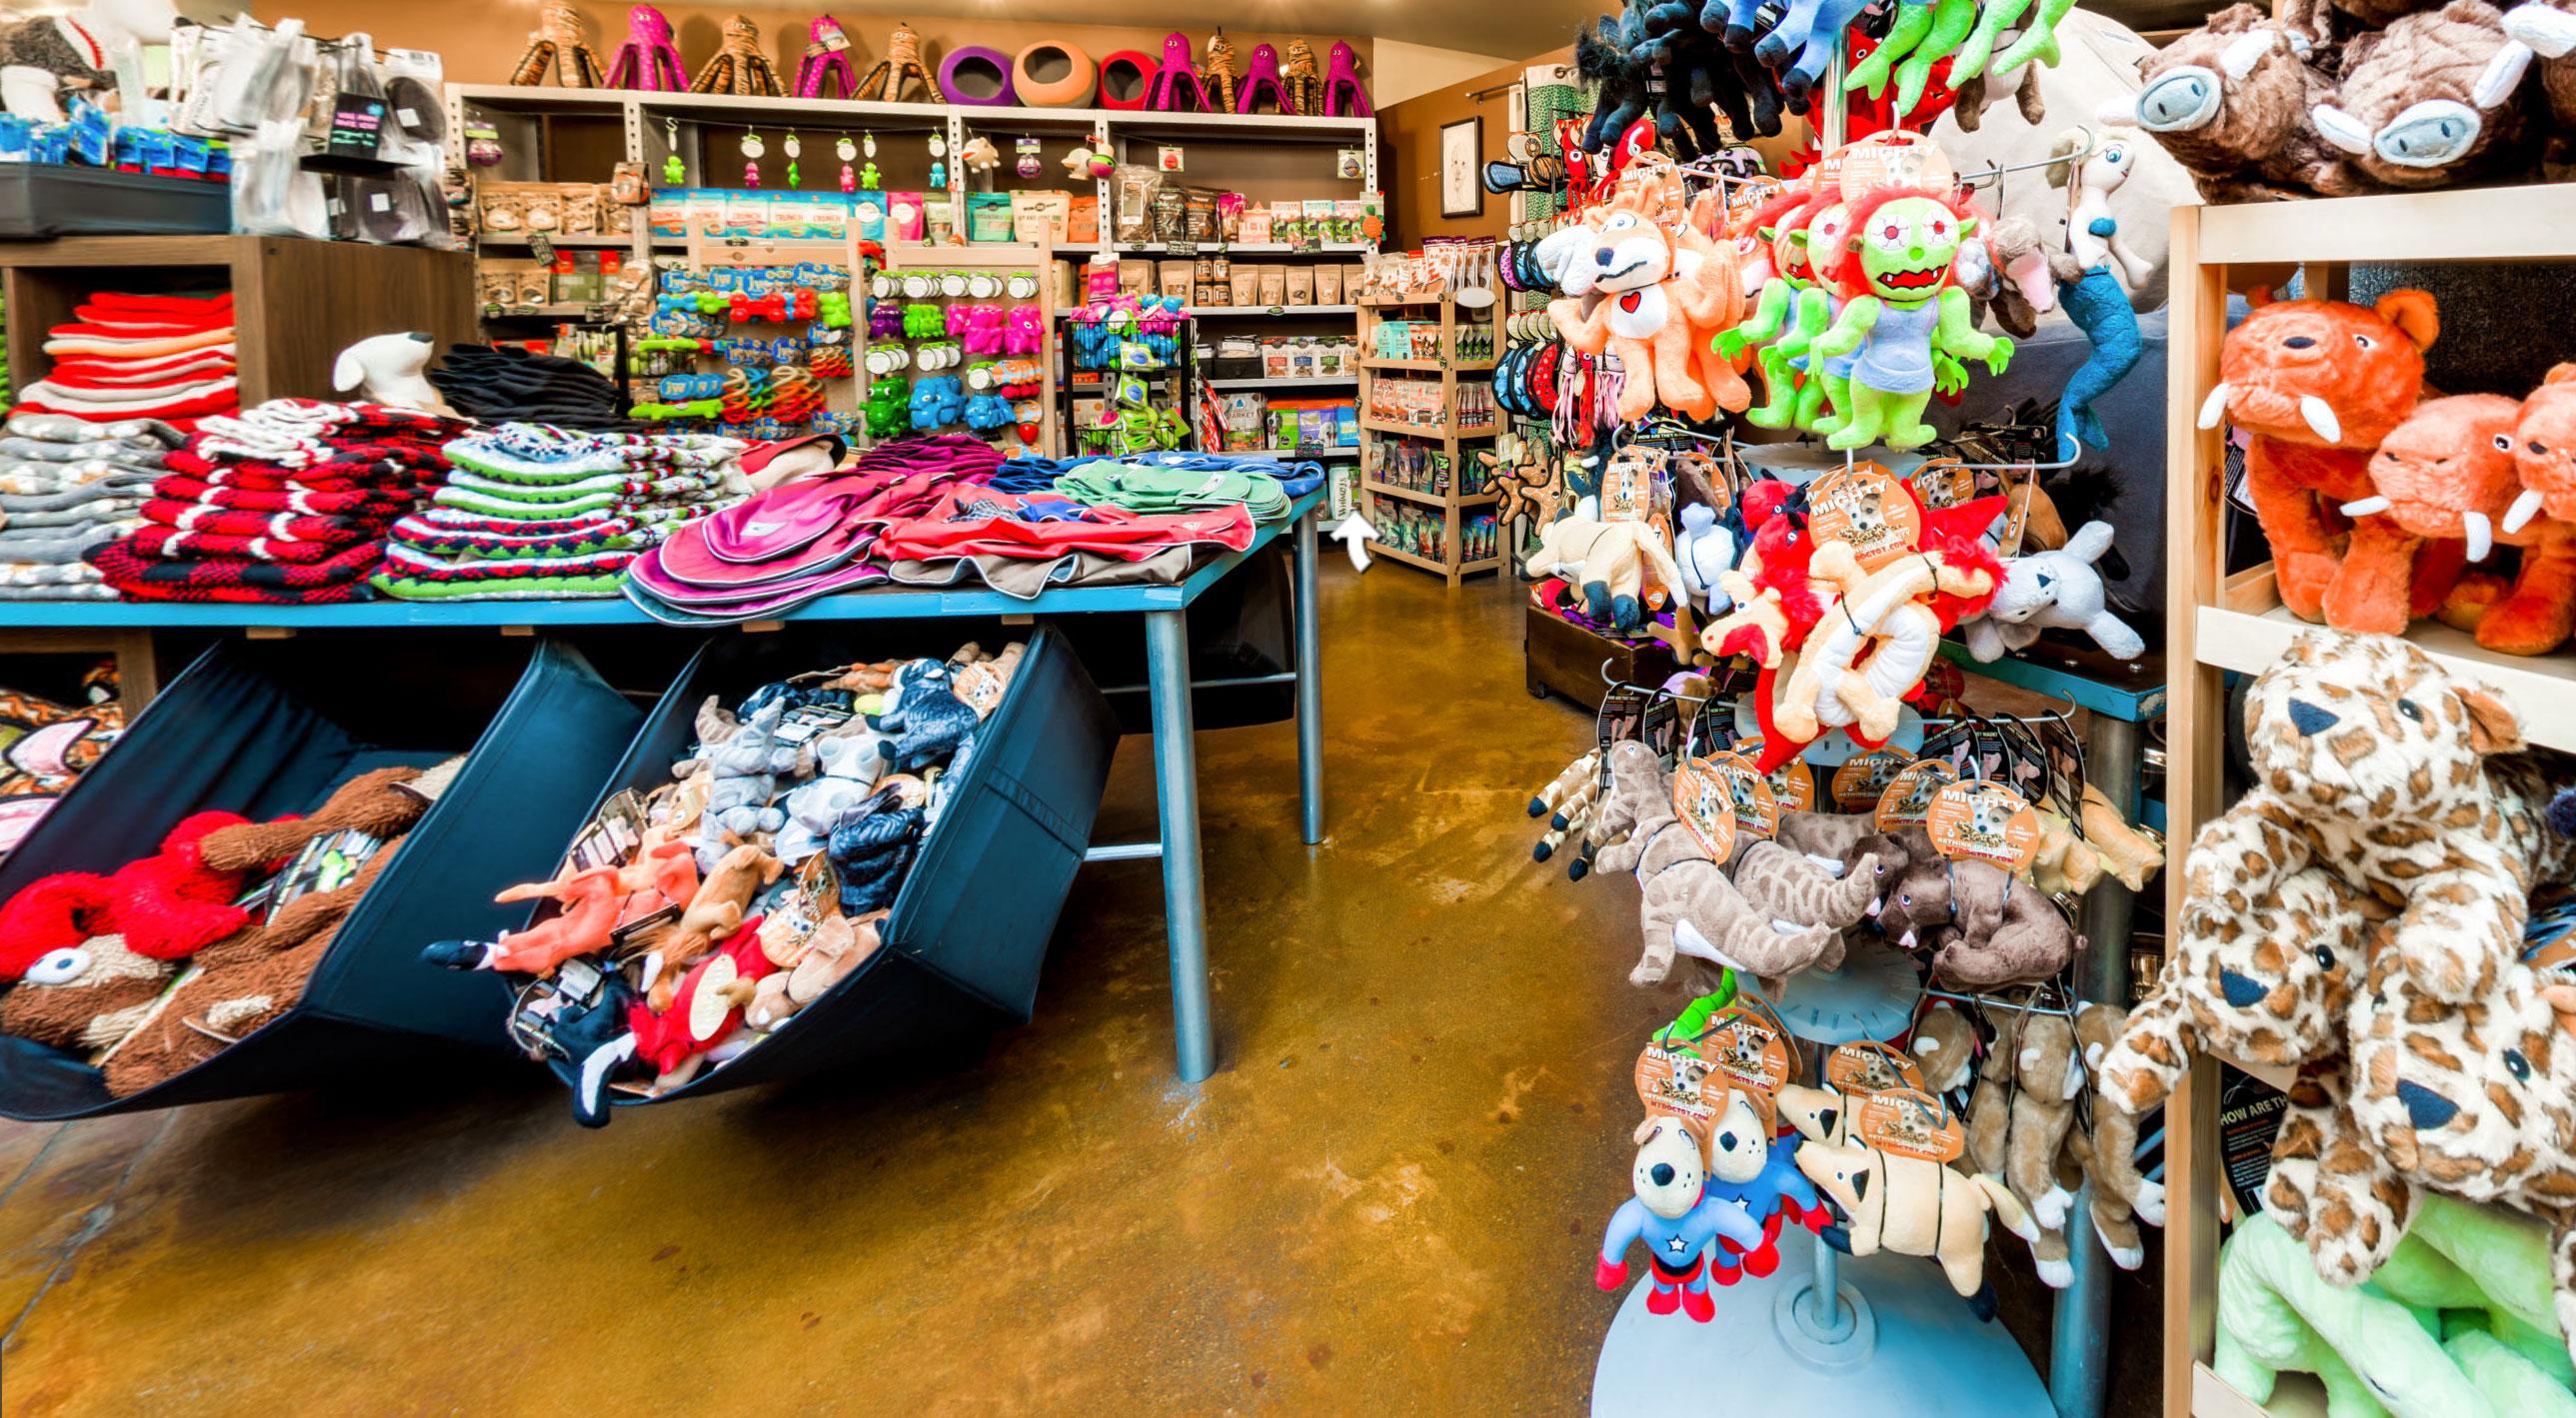 Shop Holistic Dog Food Treats Toys Clothing Health